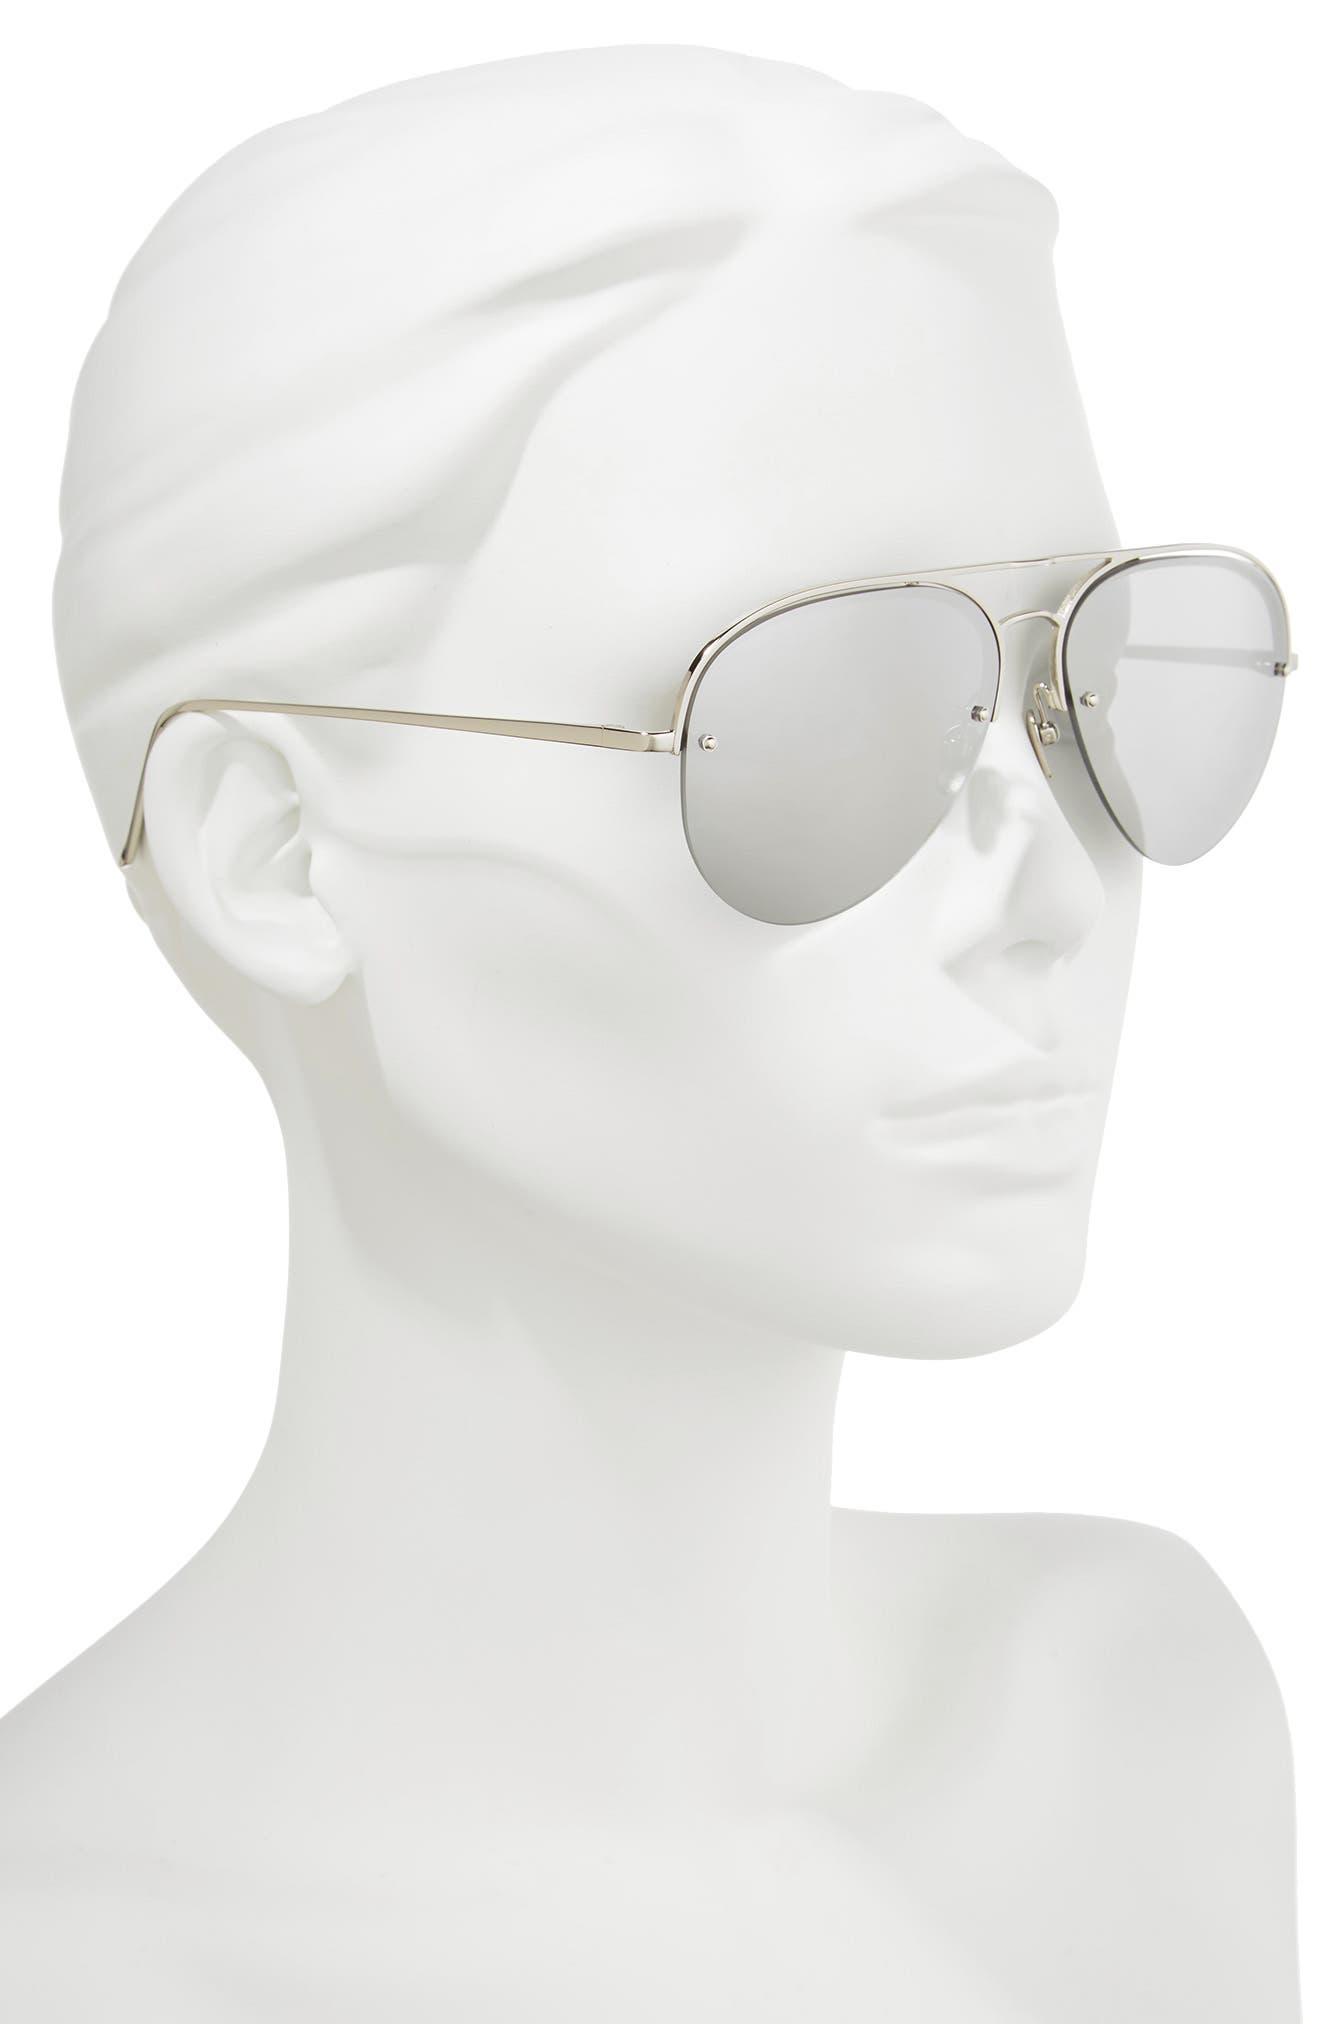 60mm Mirrored 18 Karat Gold Aviator Sunglasses,                             Alternate thumbnail 2, color,                             710